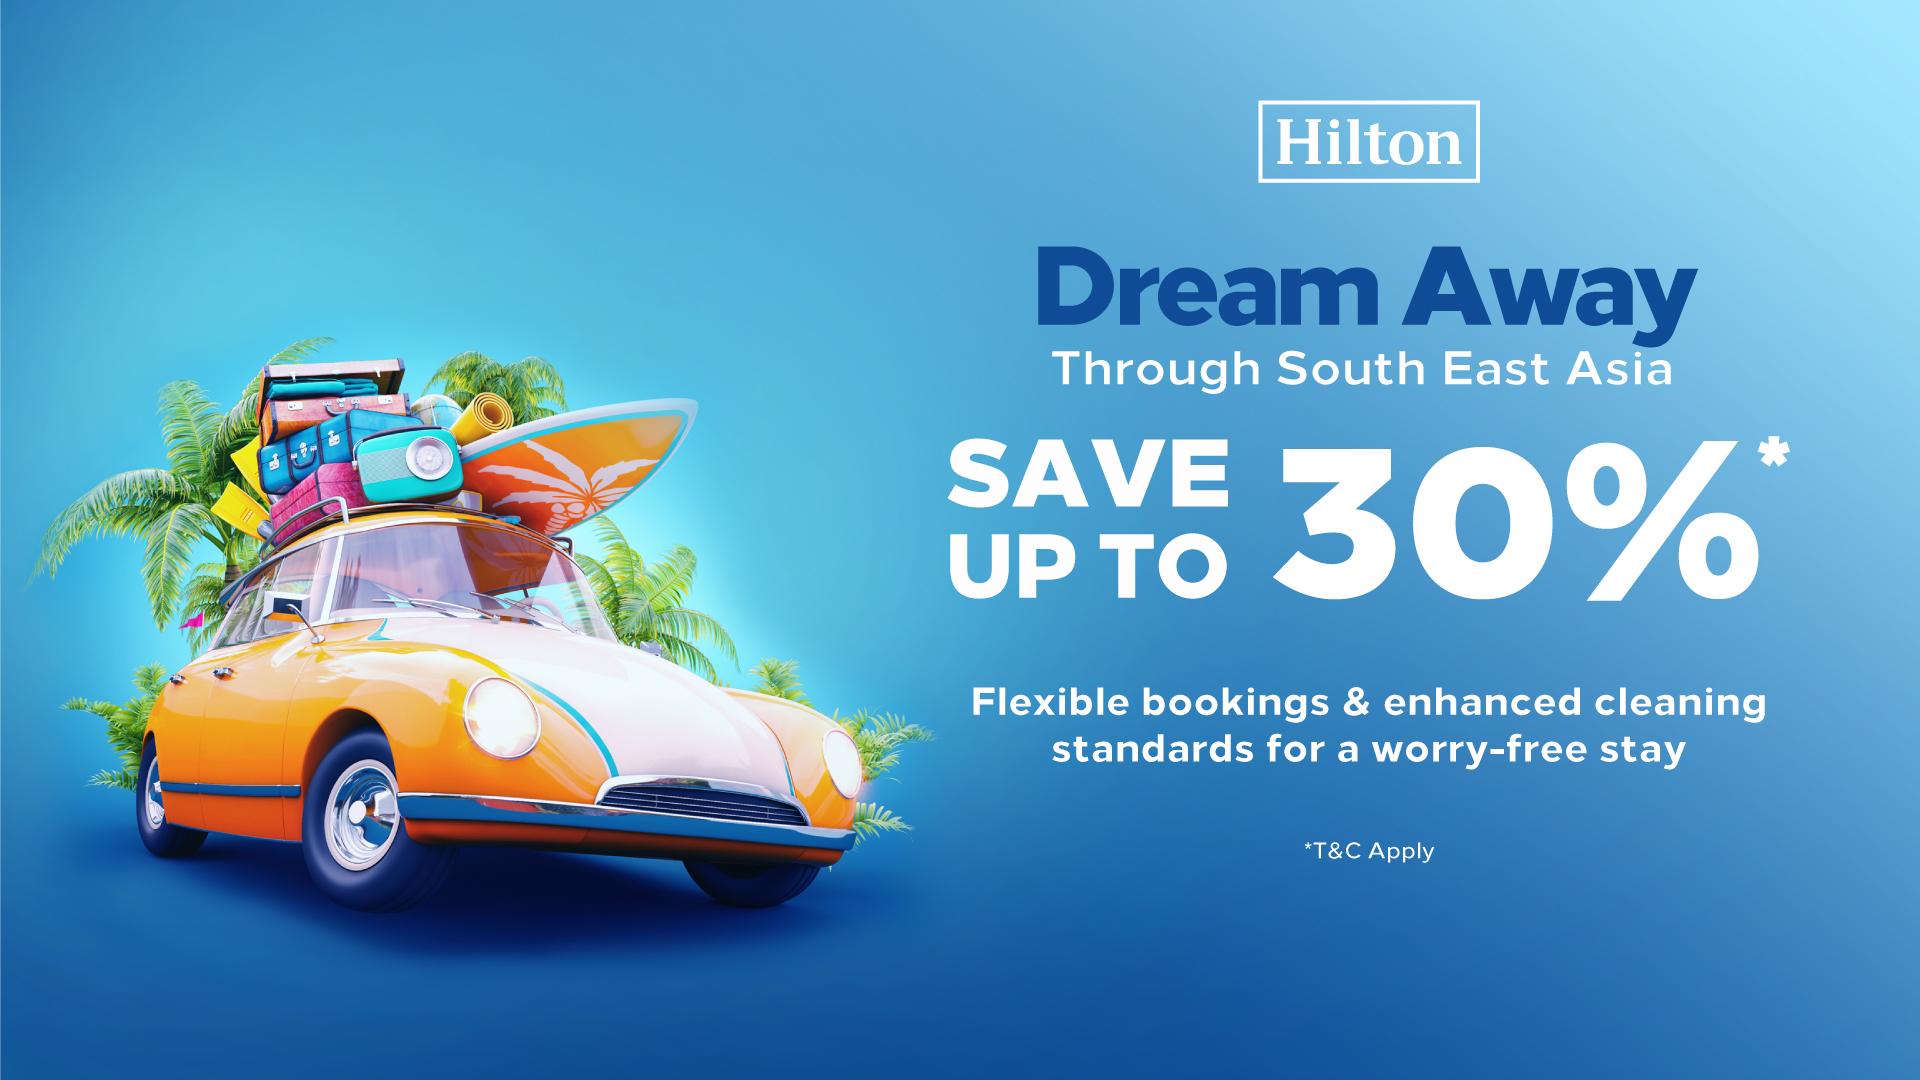 The great #DreamAwaySale by Hilton is BACK!